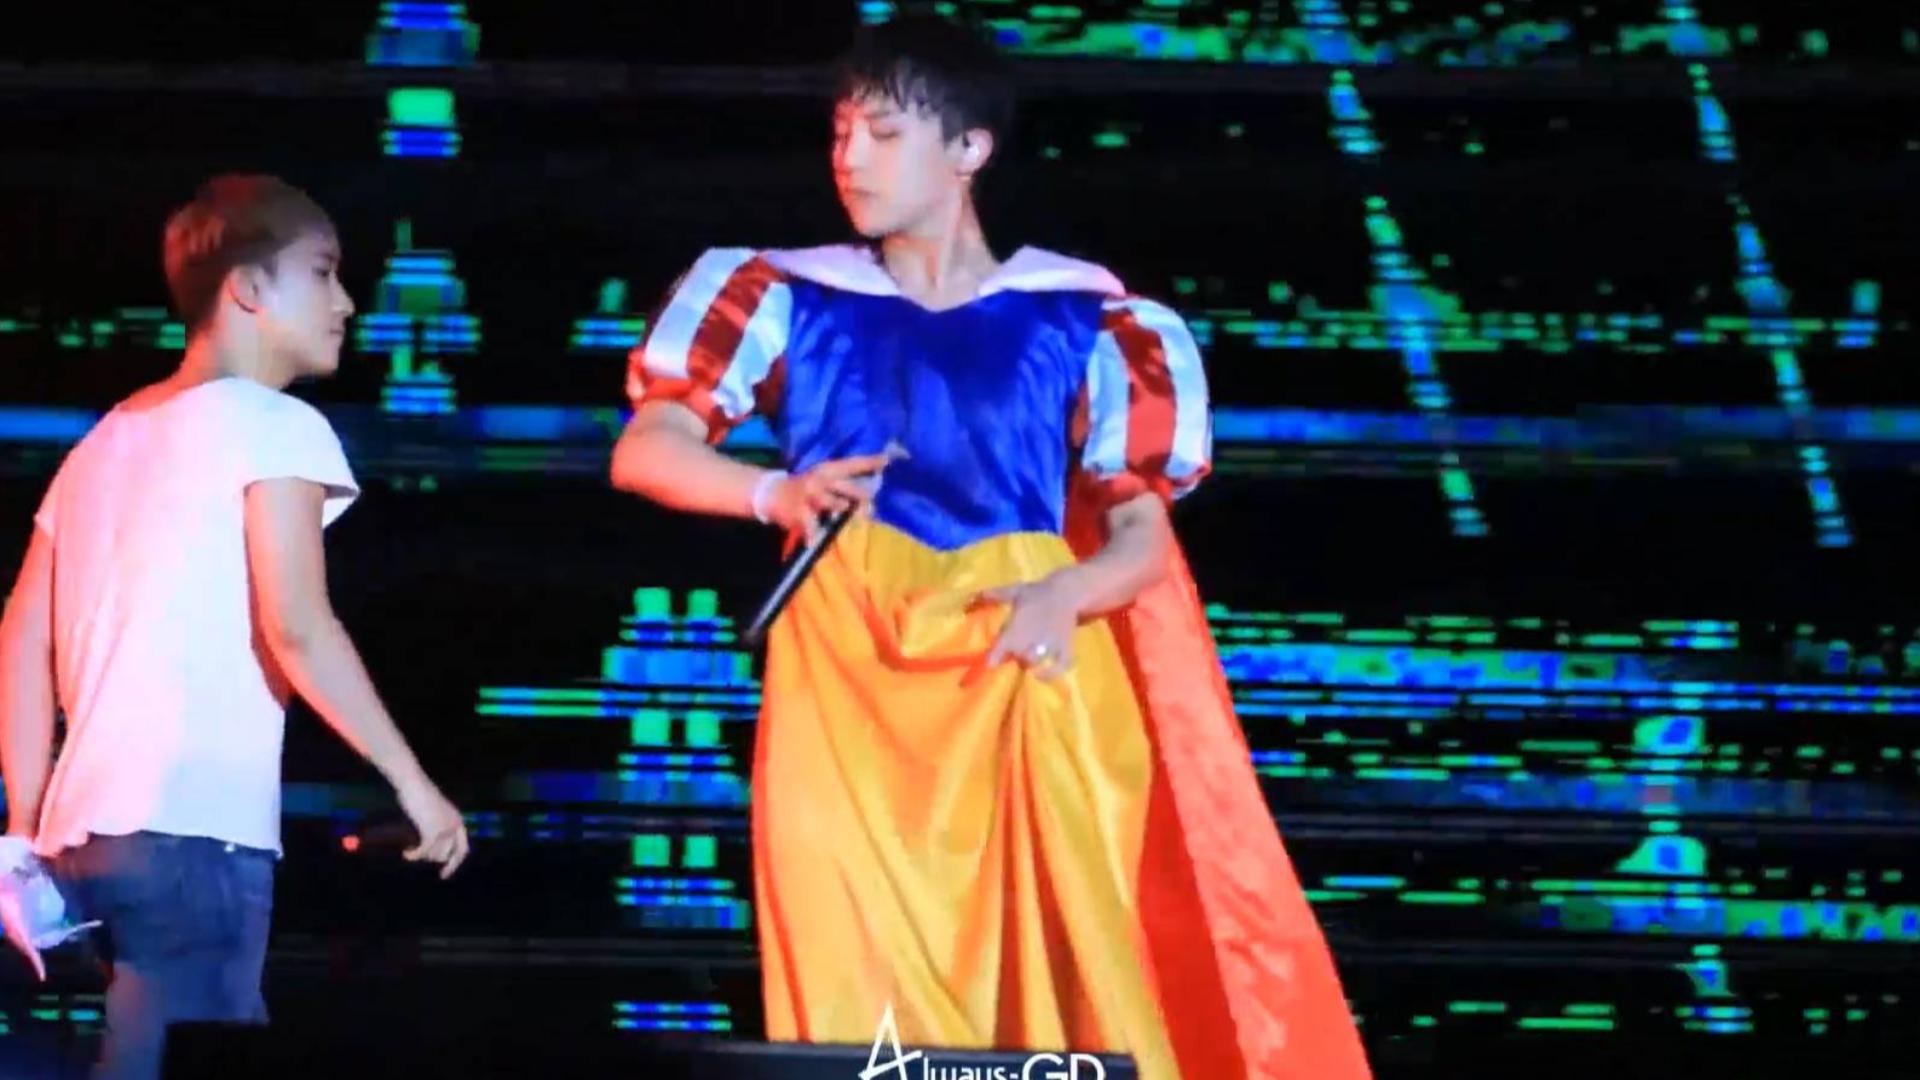 bigbang演唱会,权志龙白雪公主版,你见过这么狂野的公主吗?